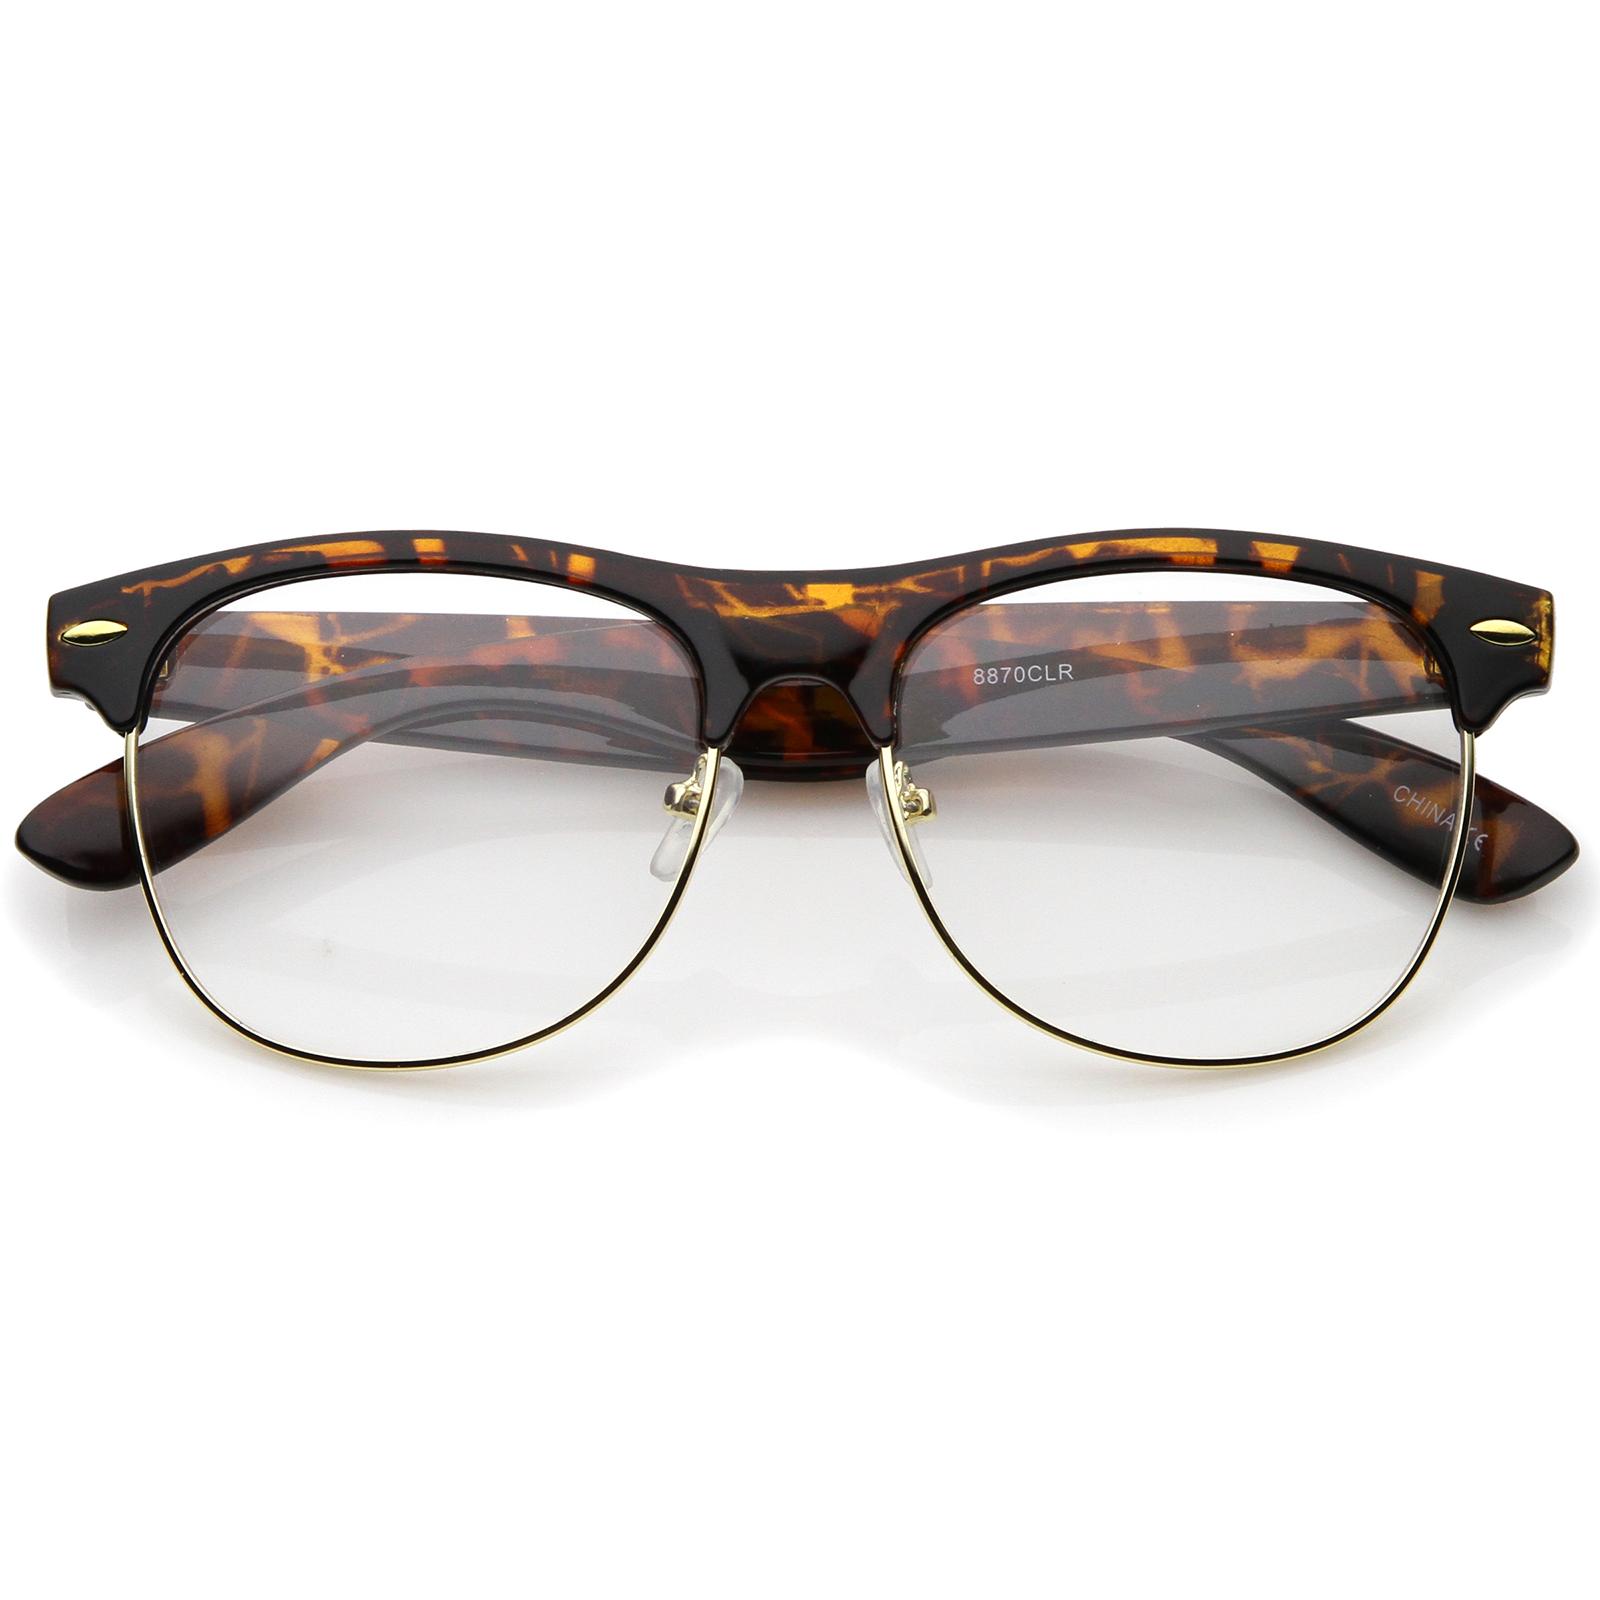 Half Frame Horn Rimmed Glasses : sunglassLA Classic Horn Rimmed Clear Lens Half Frame ...